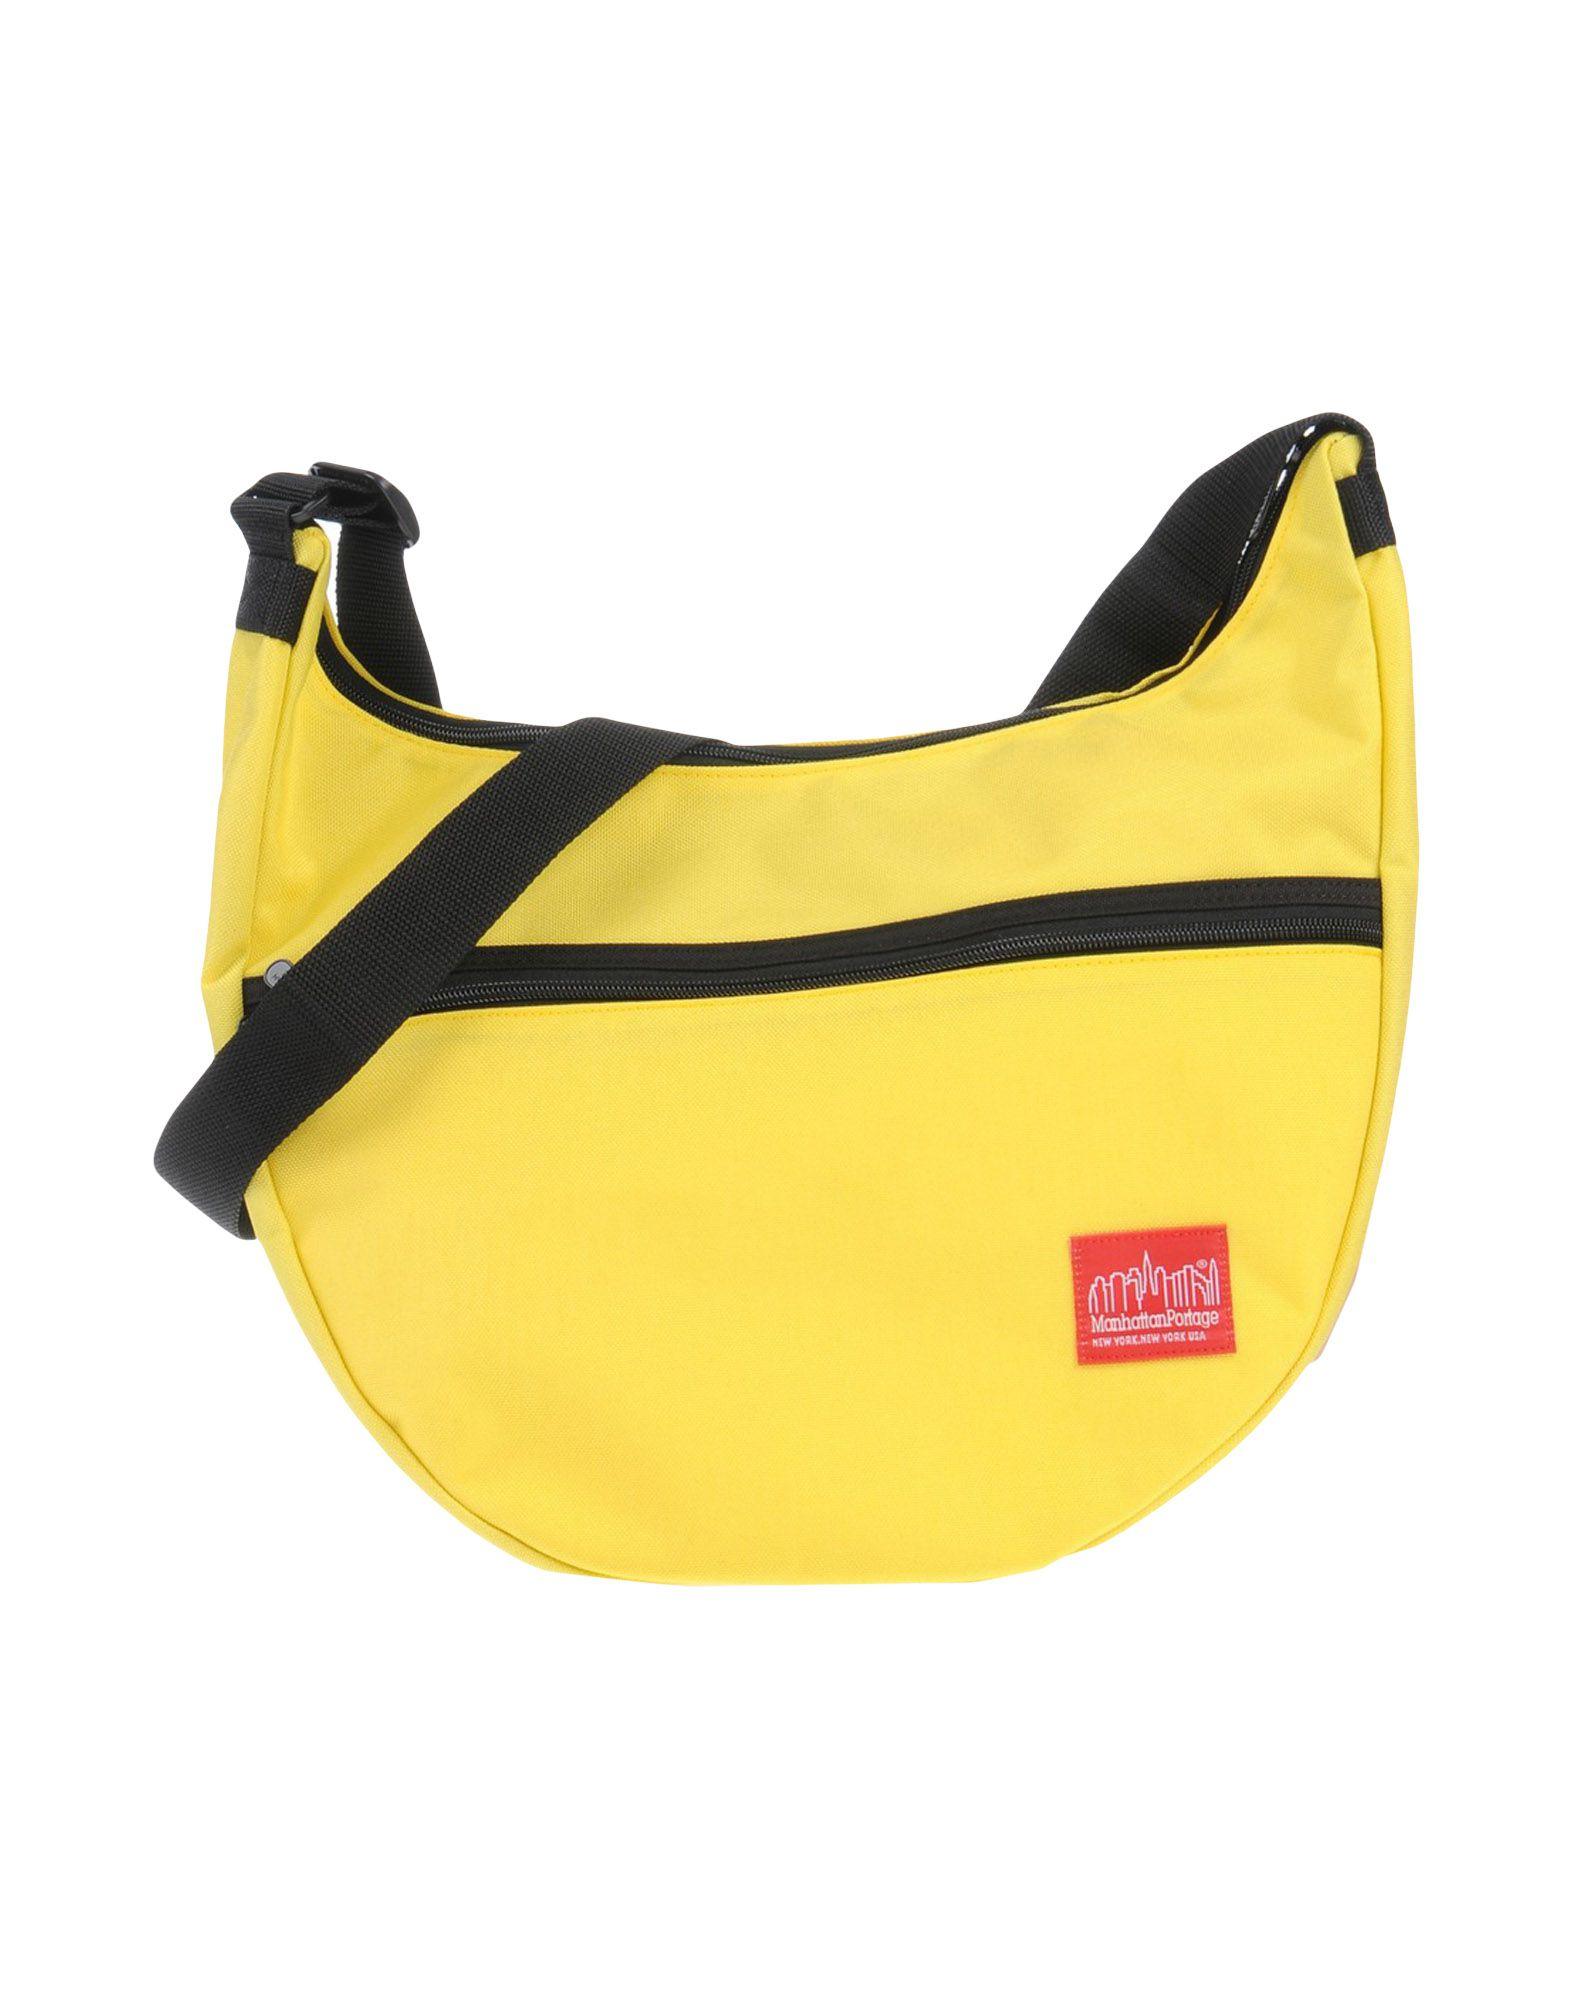 MANHATTAN PORTAGE Сумка через плечо сумка через плечо anais gvani croco ag 1471 350161